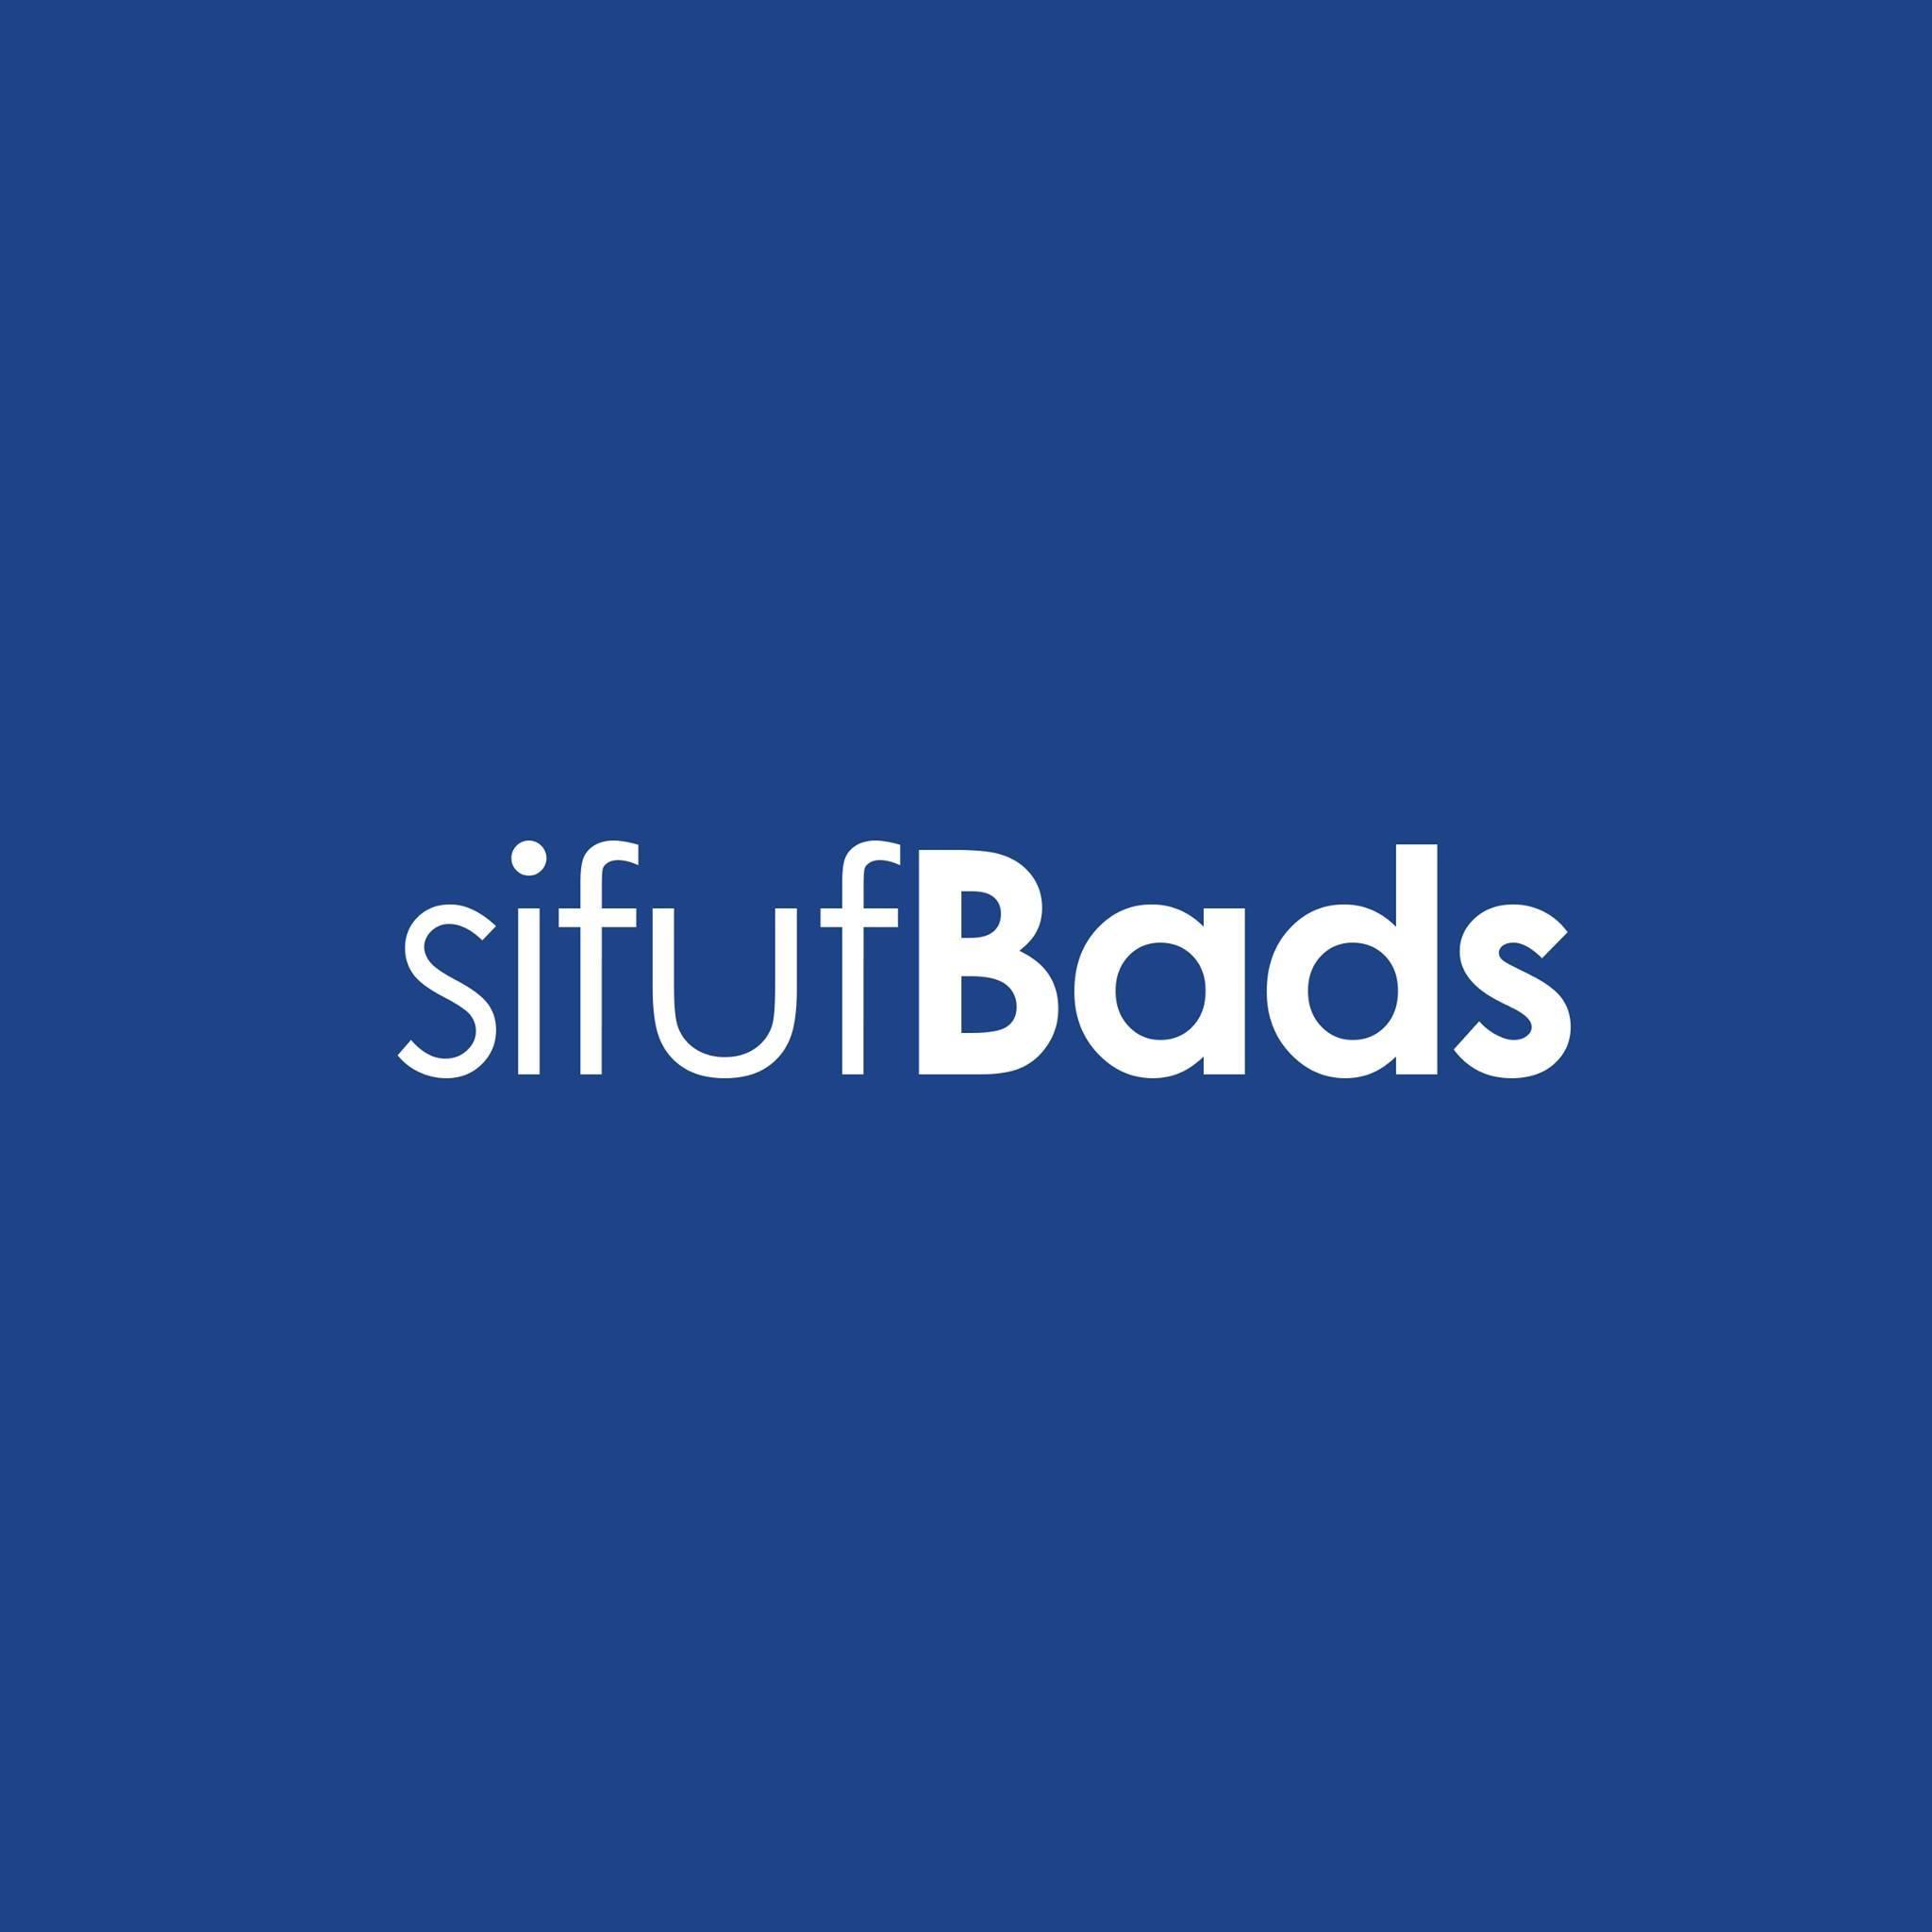 jobs in Sifufbads Sdn Bhd